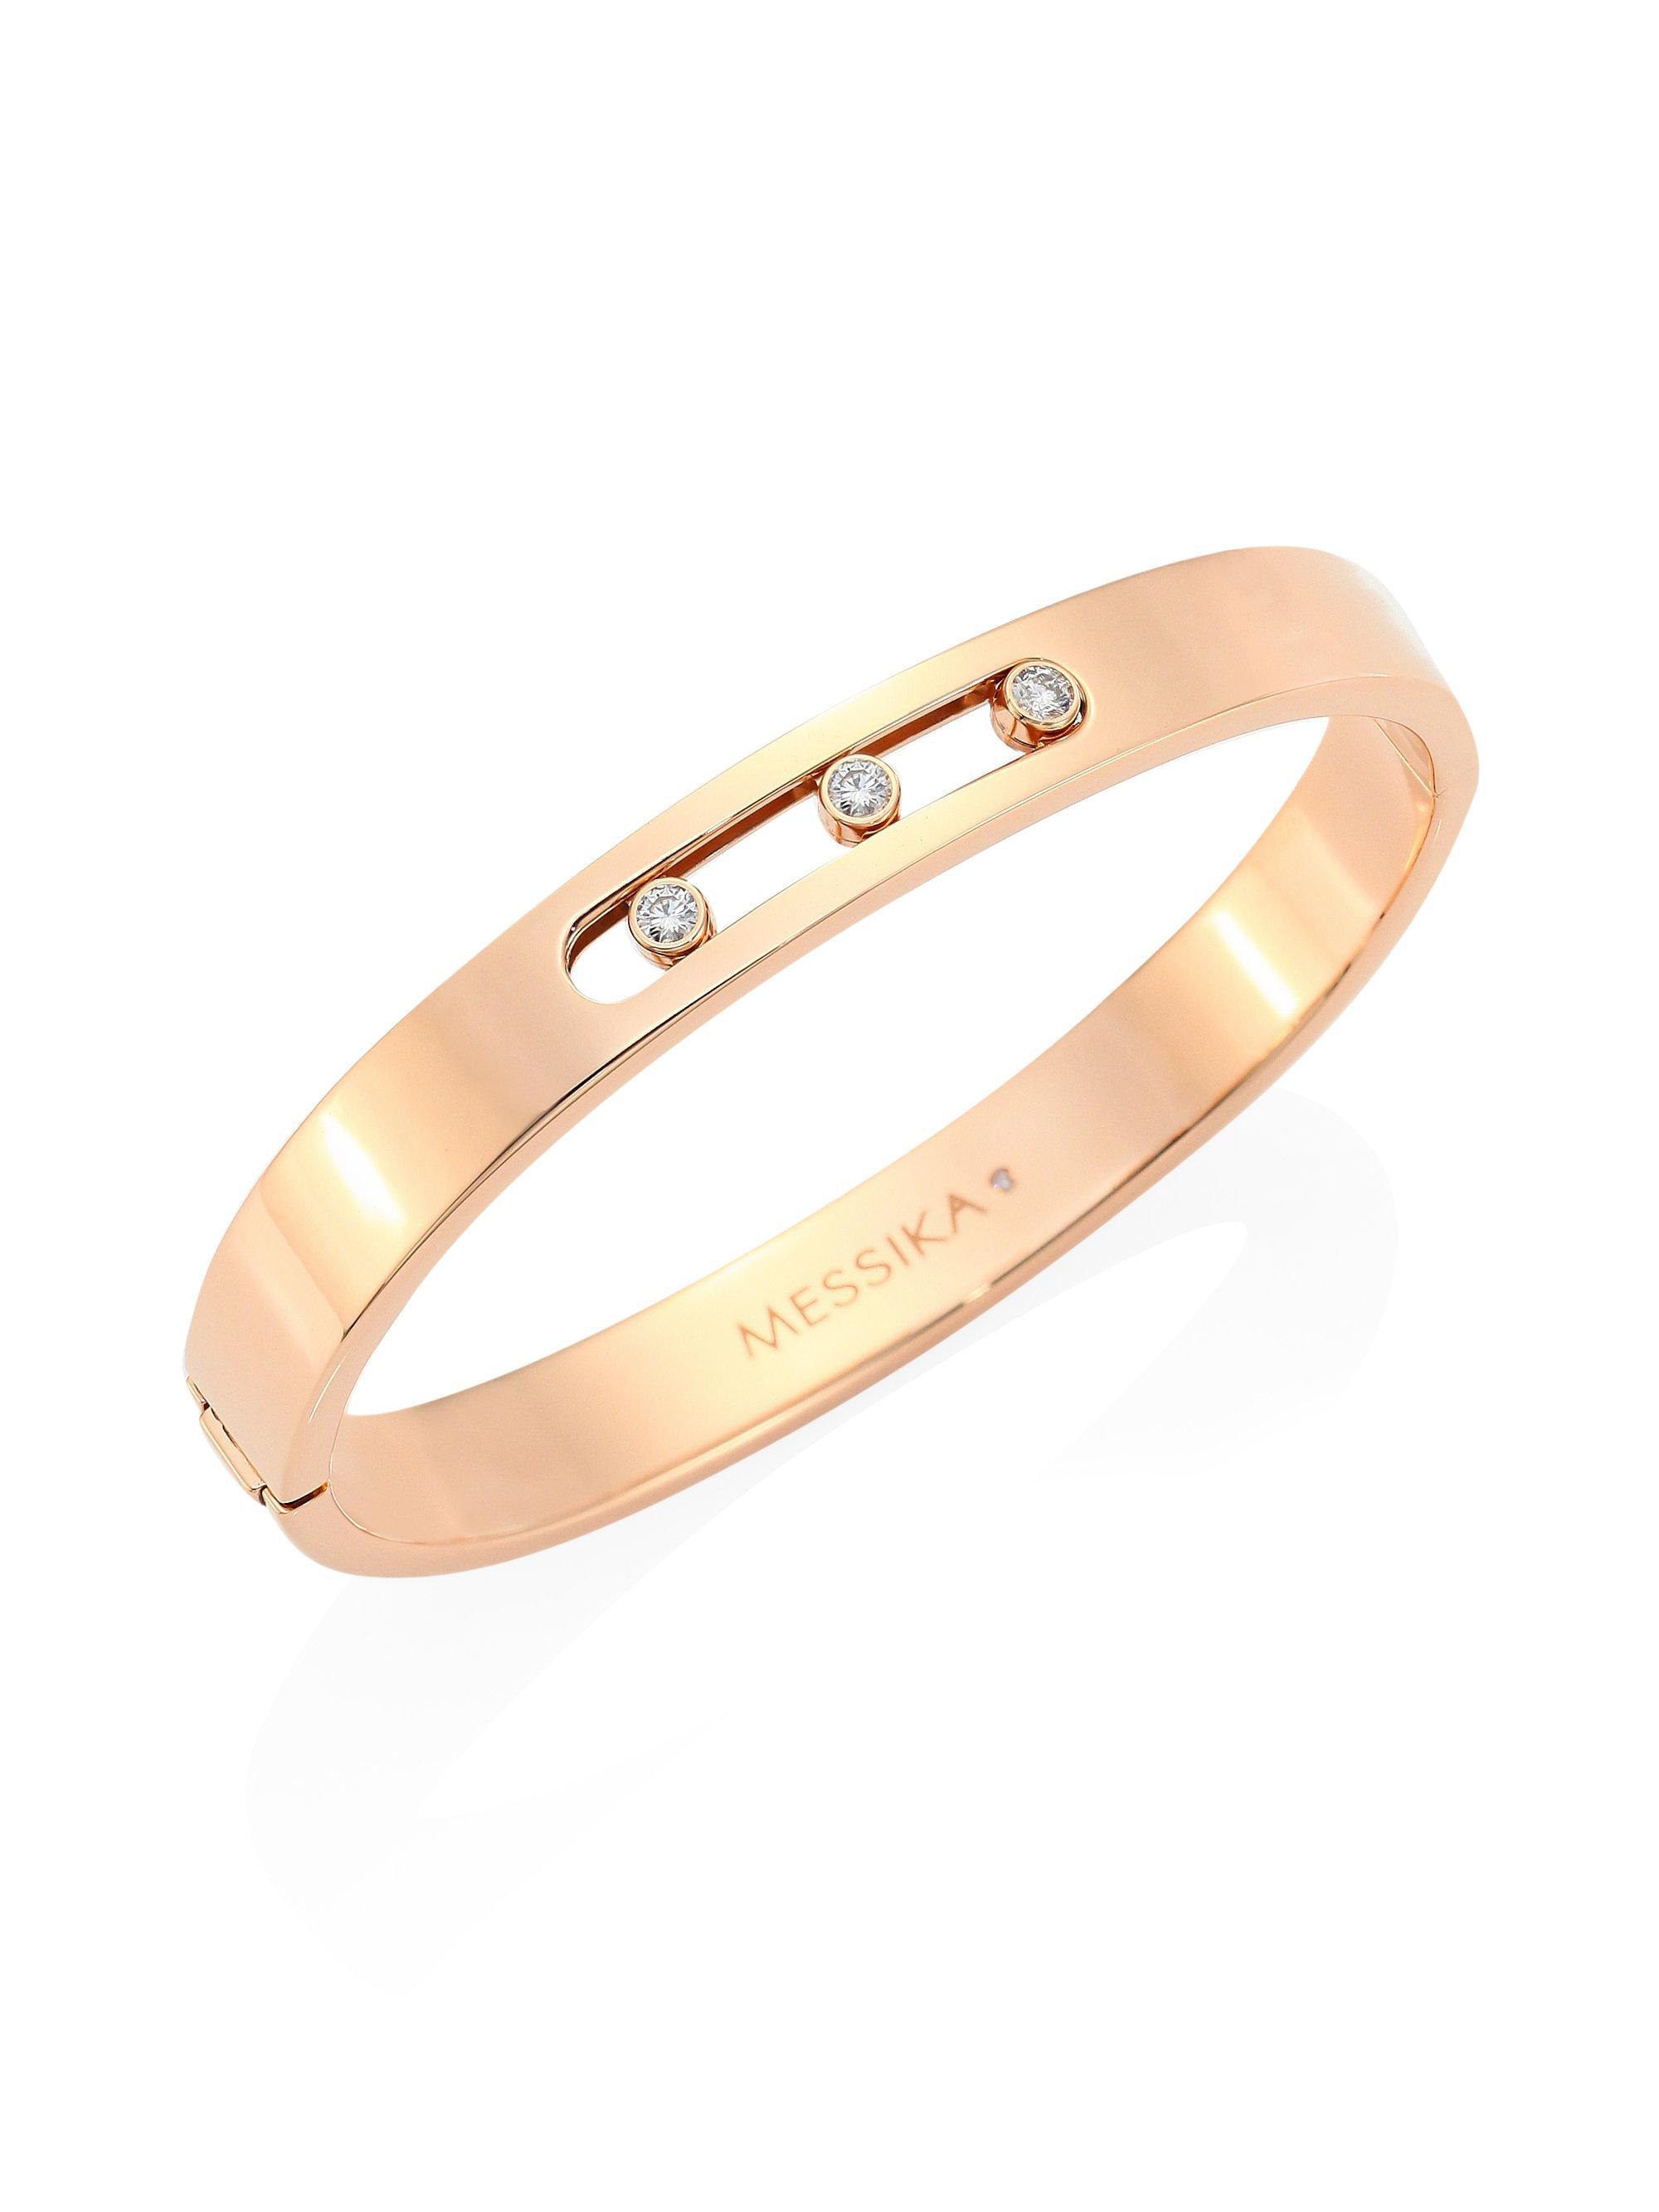 Move Noa 18-karat Pink Gold Diamond Bangle - Rose gold Messika kZnJqS4